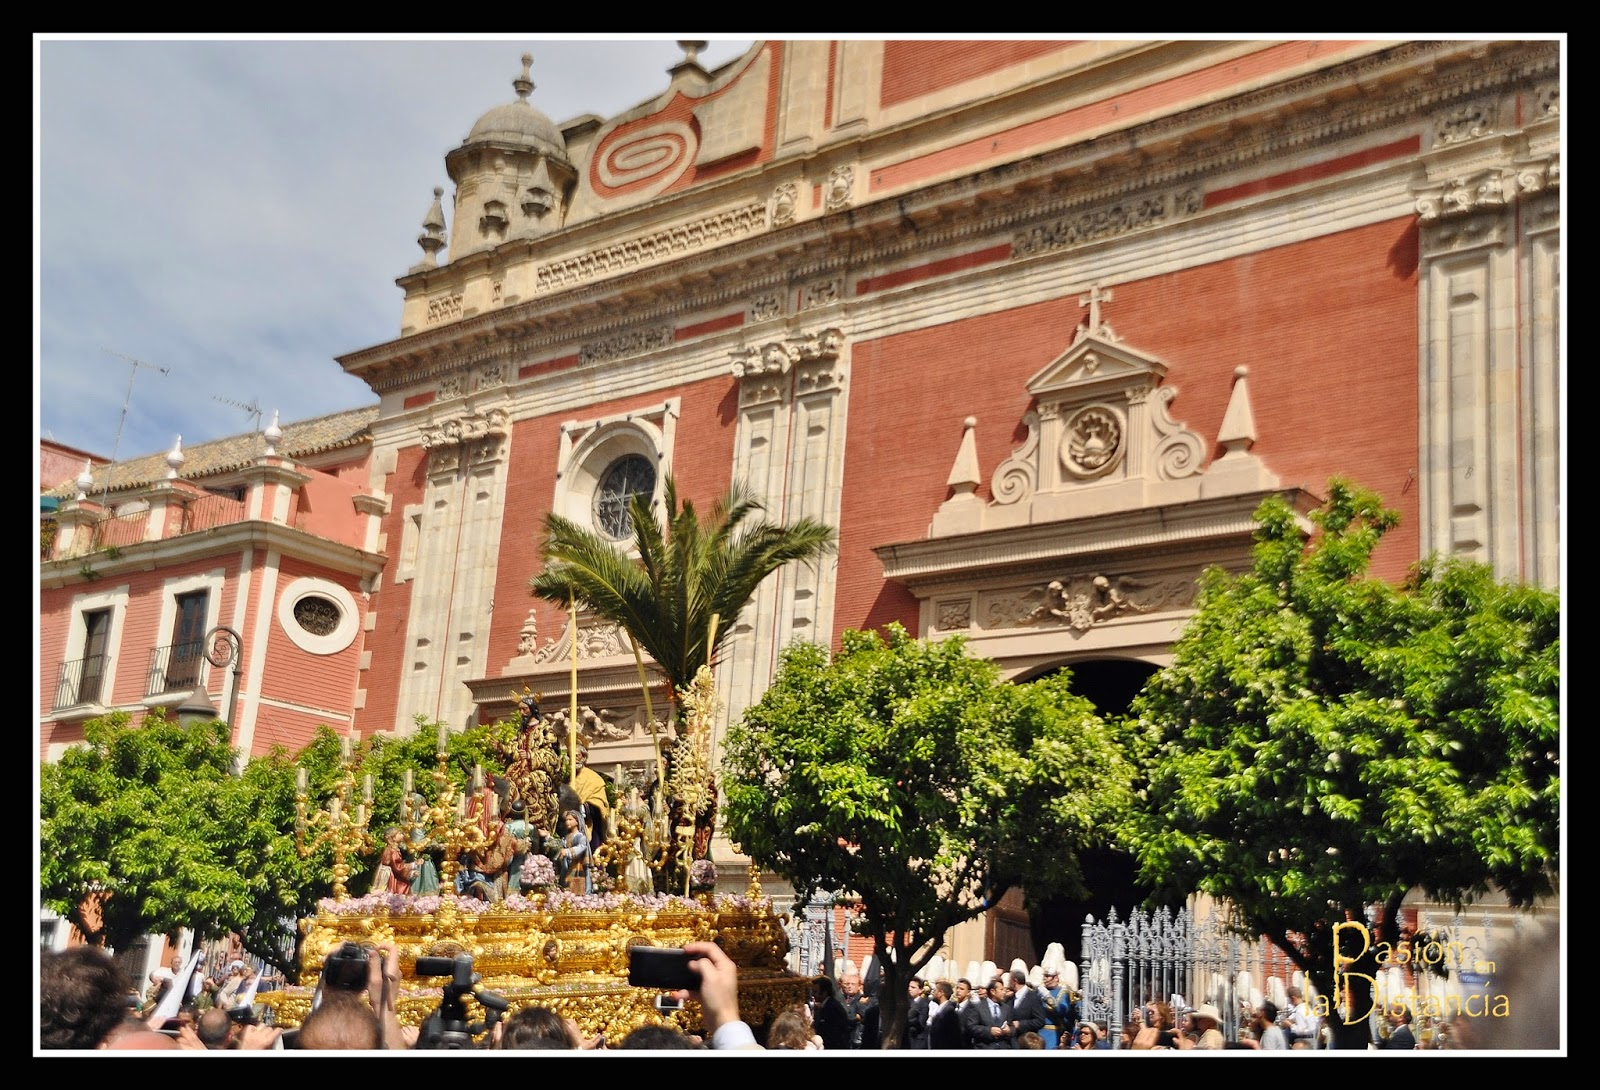 La-borriquita-saliendo-del-Salvador